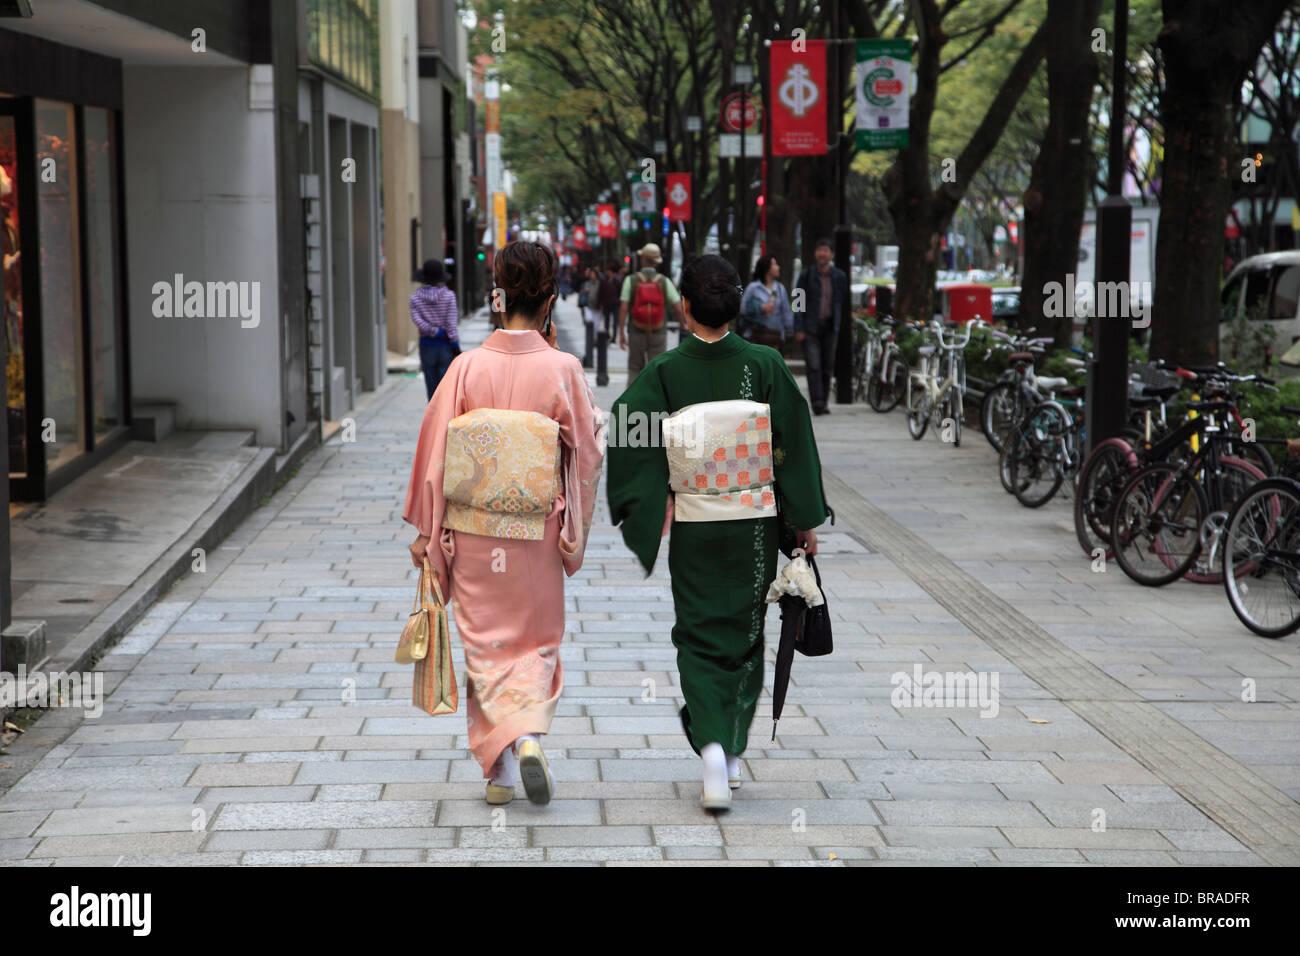 Omote-sando, upscale shopping boulevard lined with designer stores, Harajuku, Tokyo, Japan, Asia - Stock Image